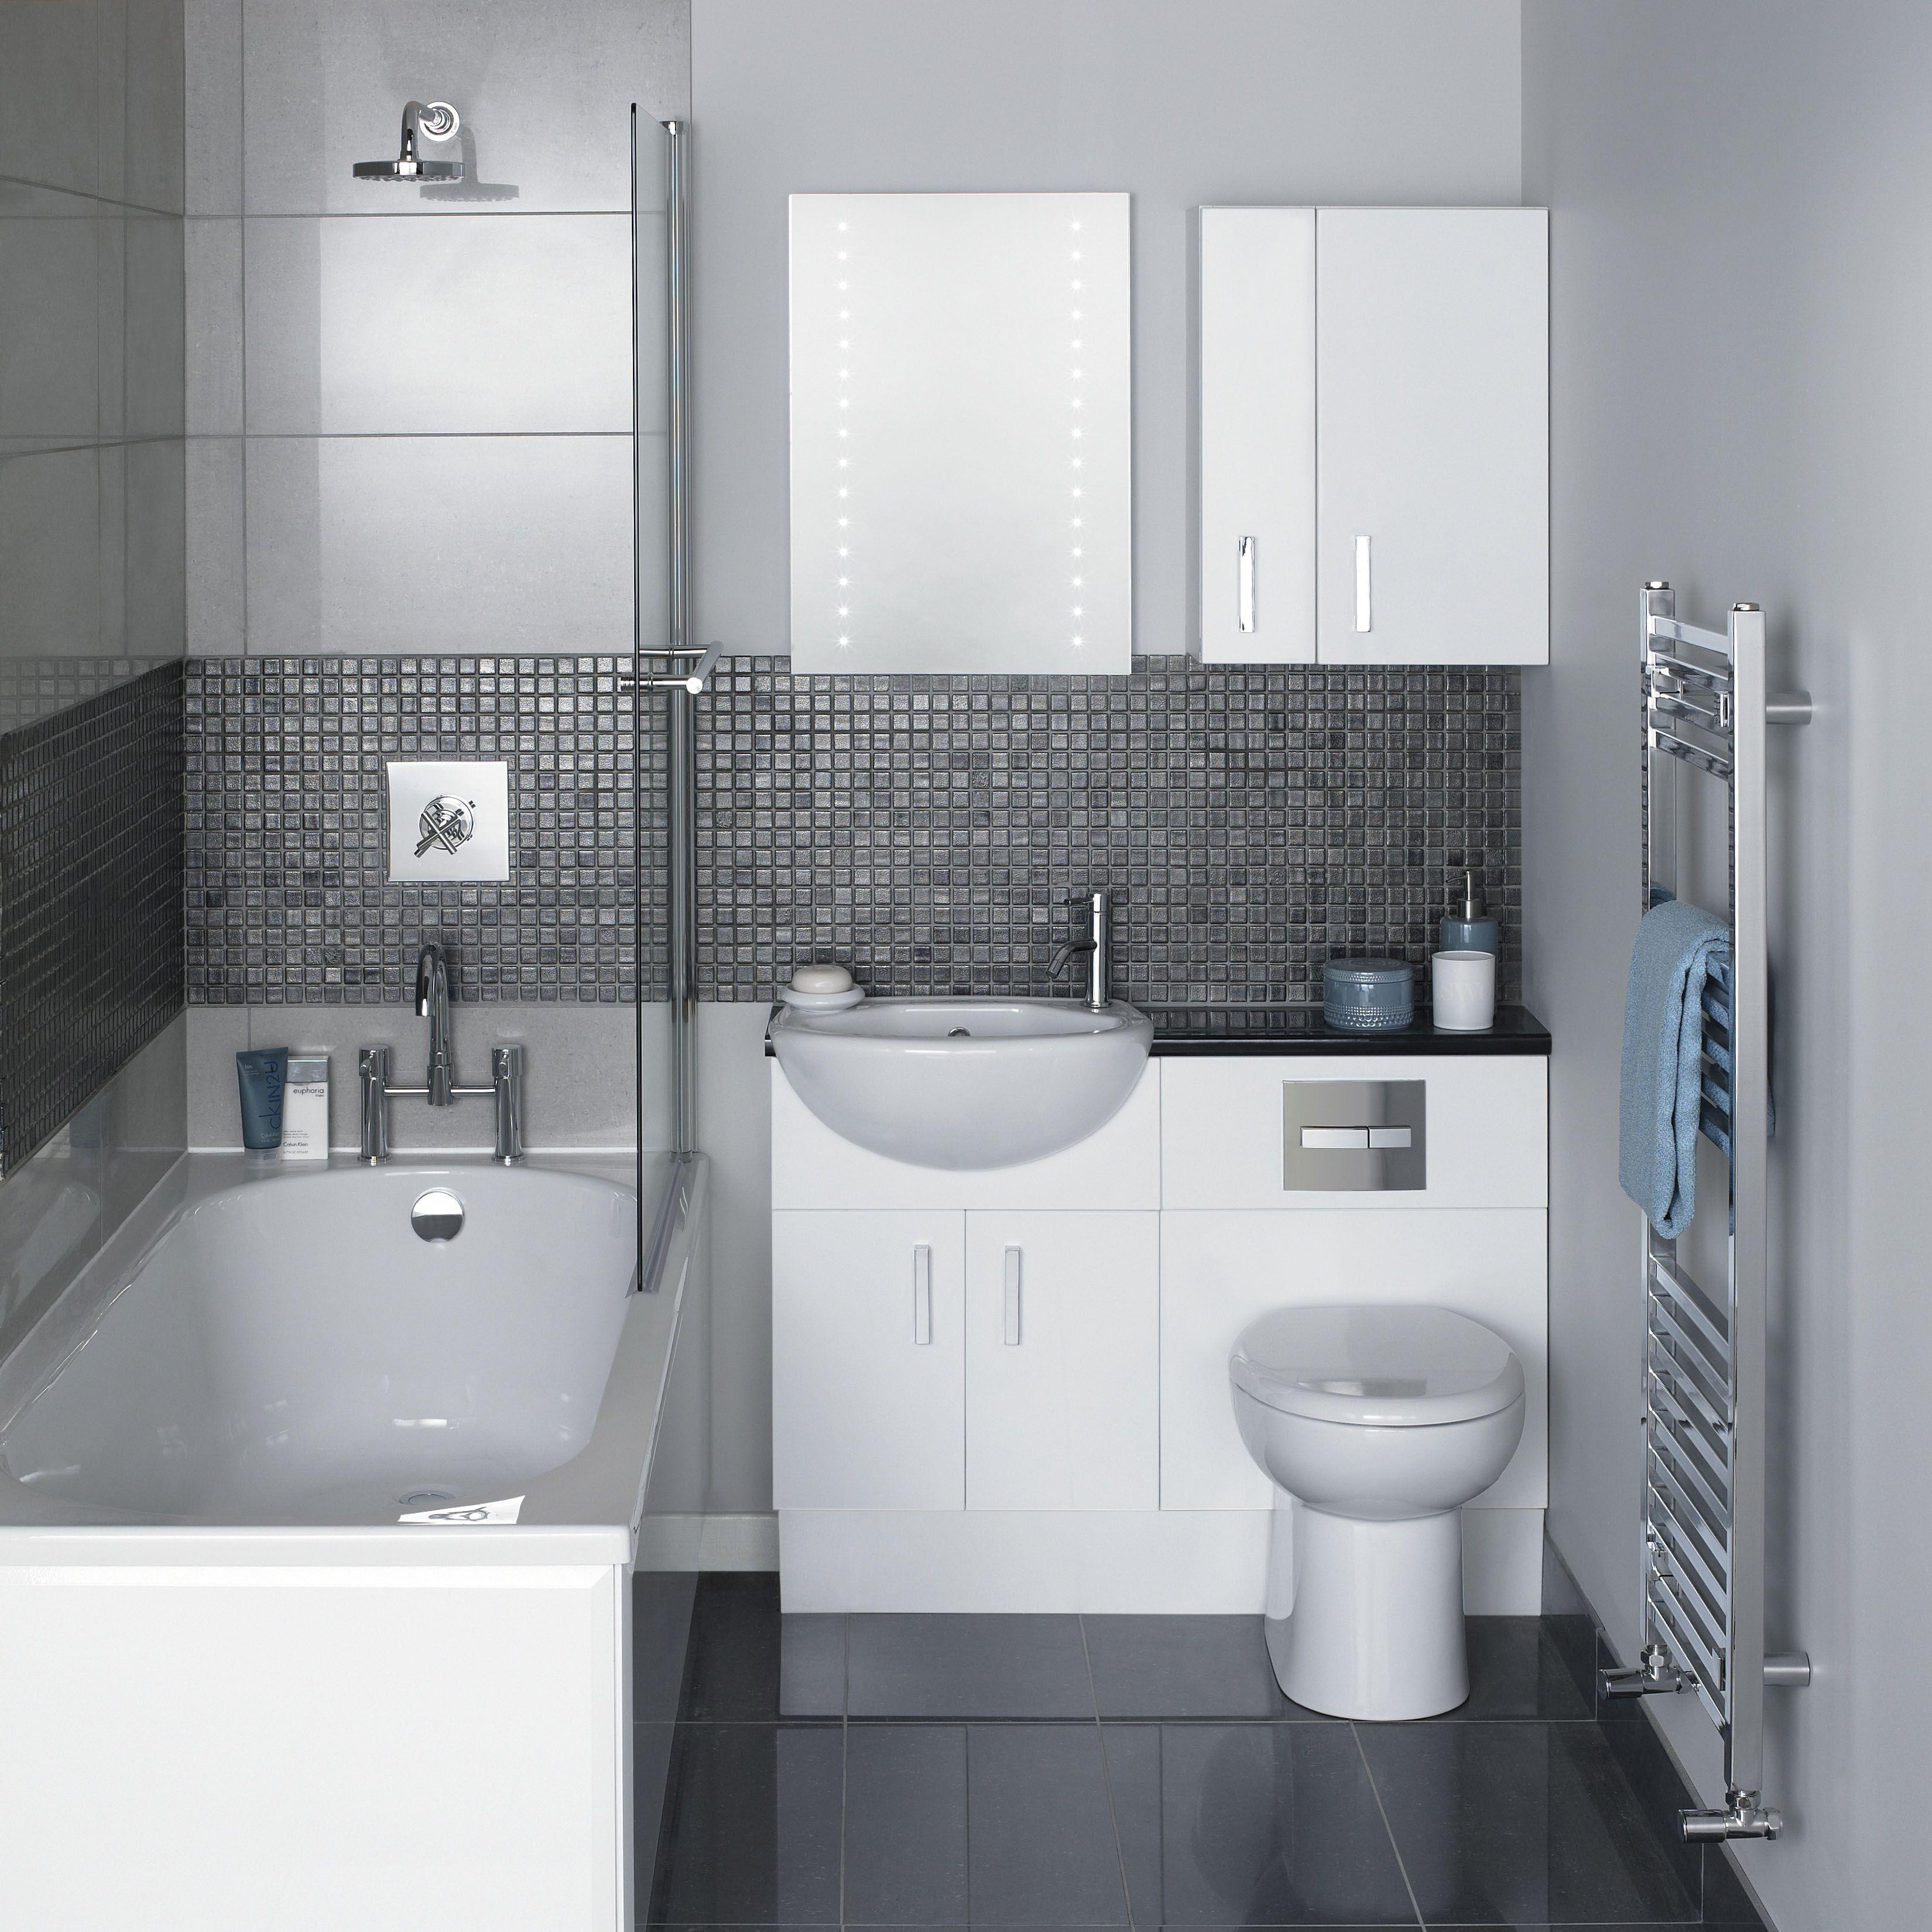 Luxury New Small Bathroom Designs Uk Ij1712q Https Ijcar 2016 Info New Small Bathroom De Renovasi Kamar Mandi Kecil Tata Letak Kamar Mandi Kamar Mandi Modern Bathroom design ideas uk